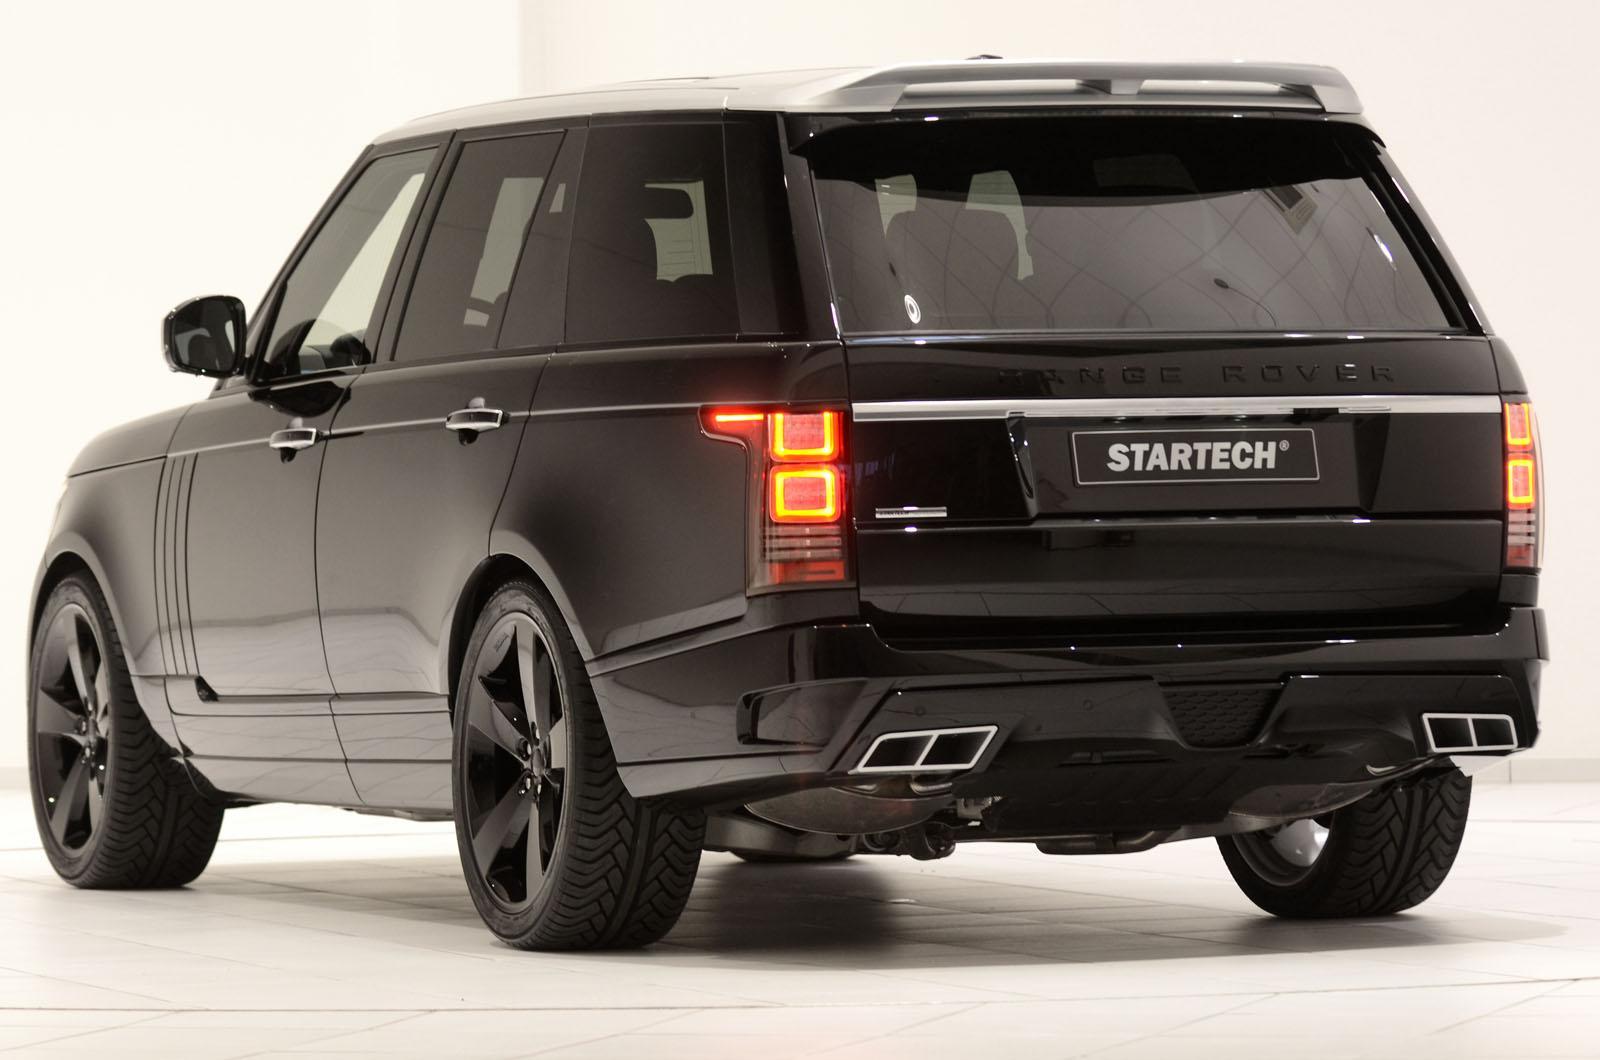 startech reveals amazing range rover body kit autoevolution. Black Bedroom Furniture Sets. Home Design Ideas